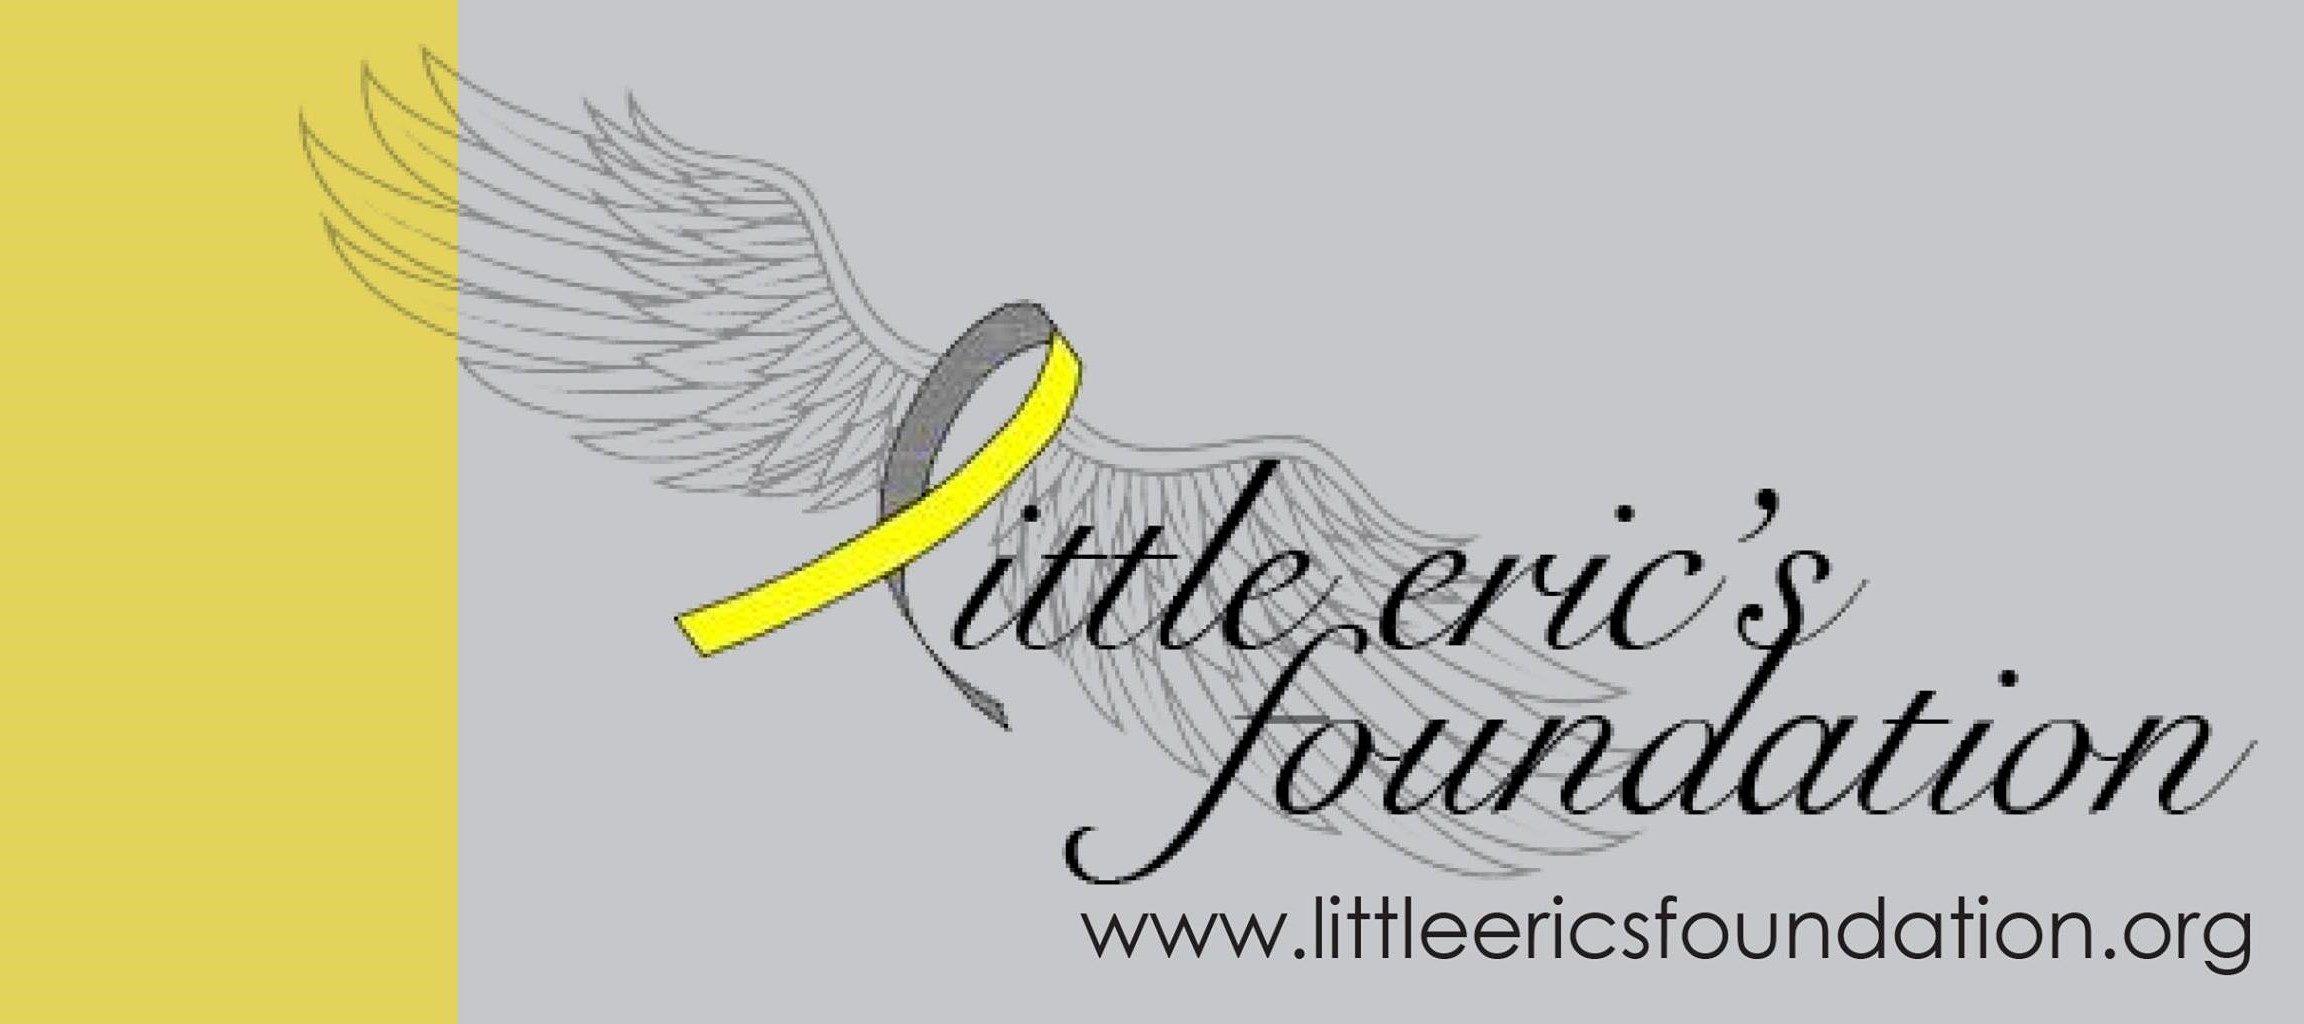 Little Eric's Foundation